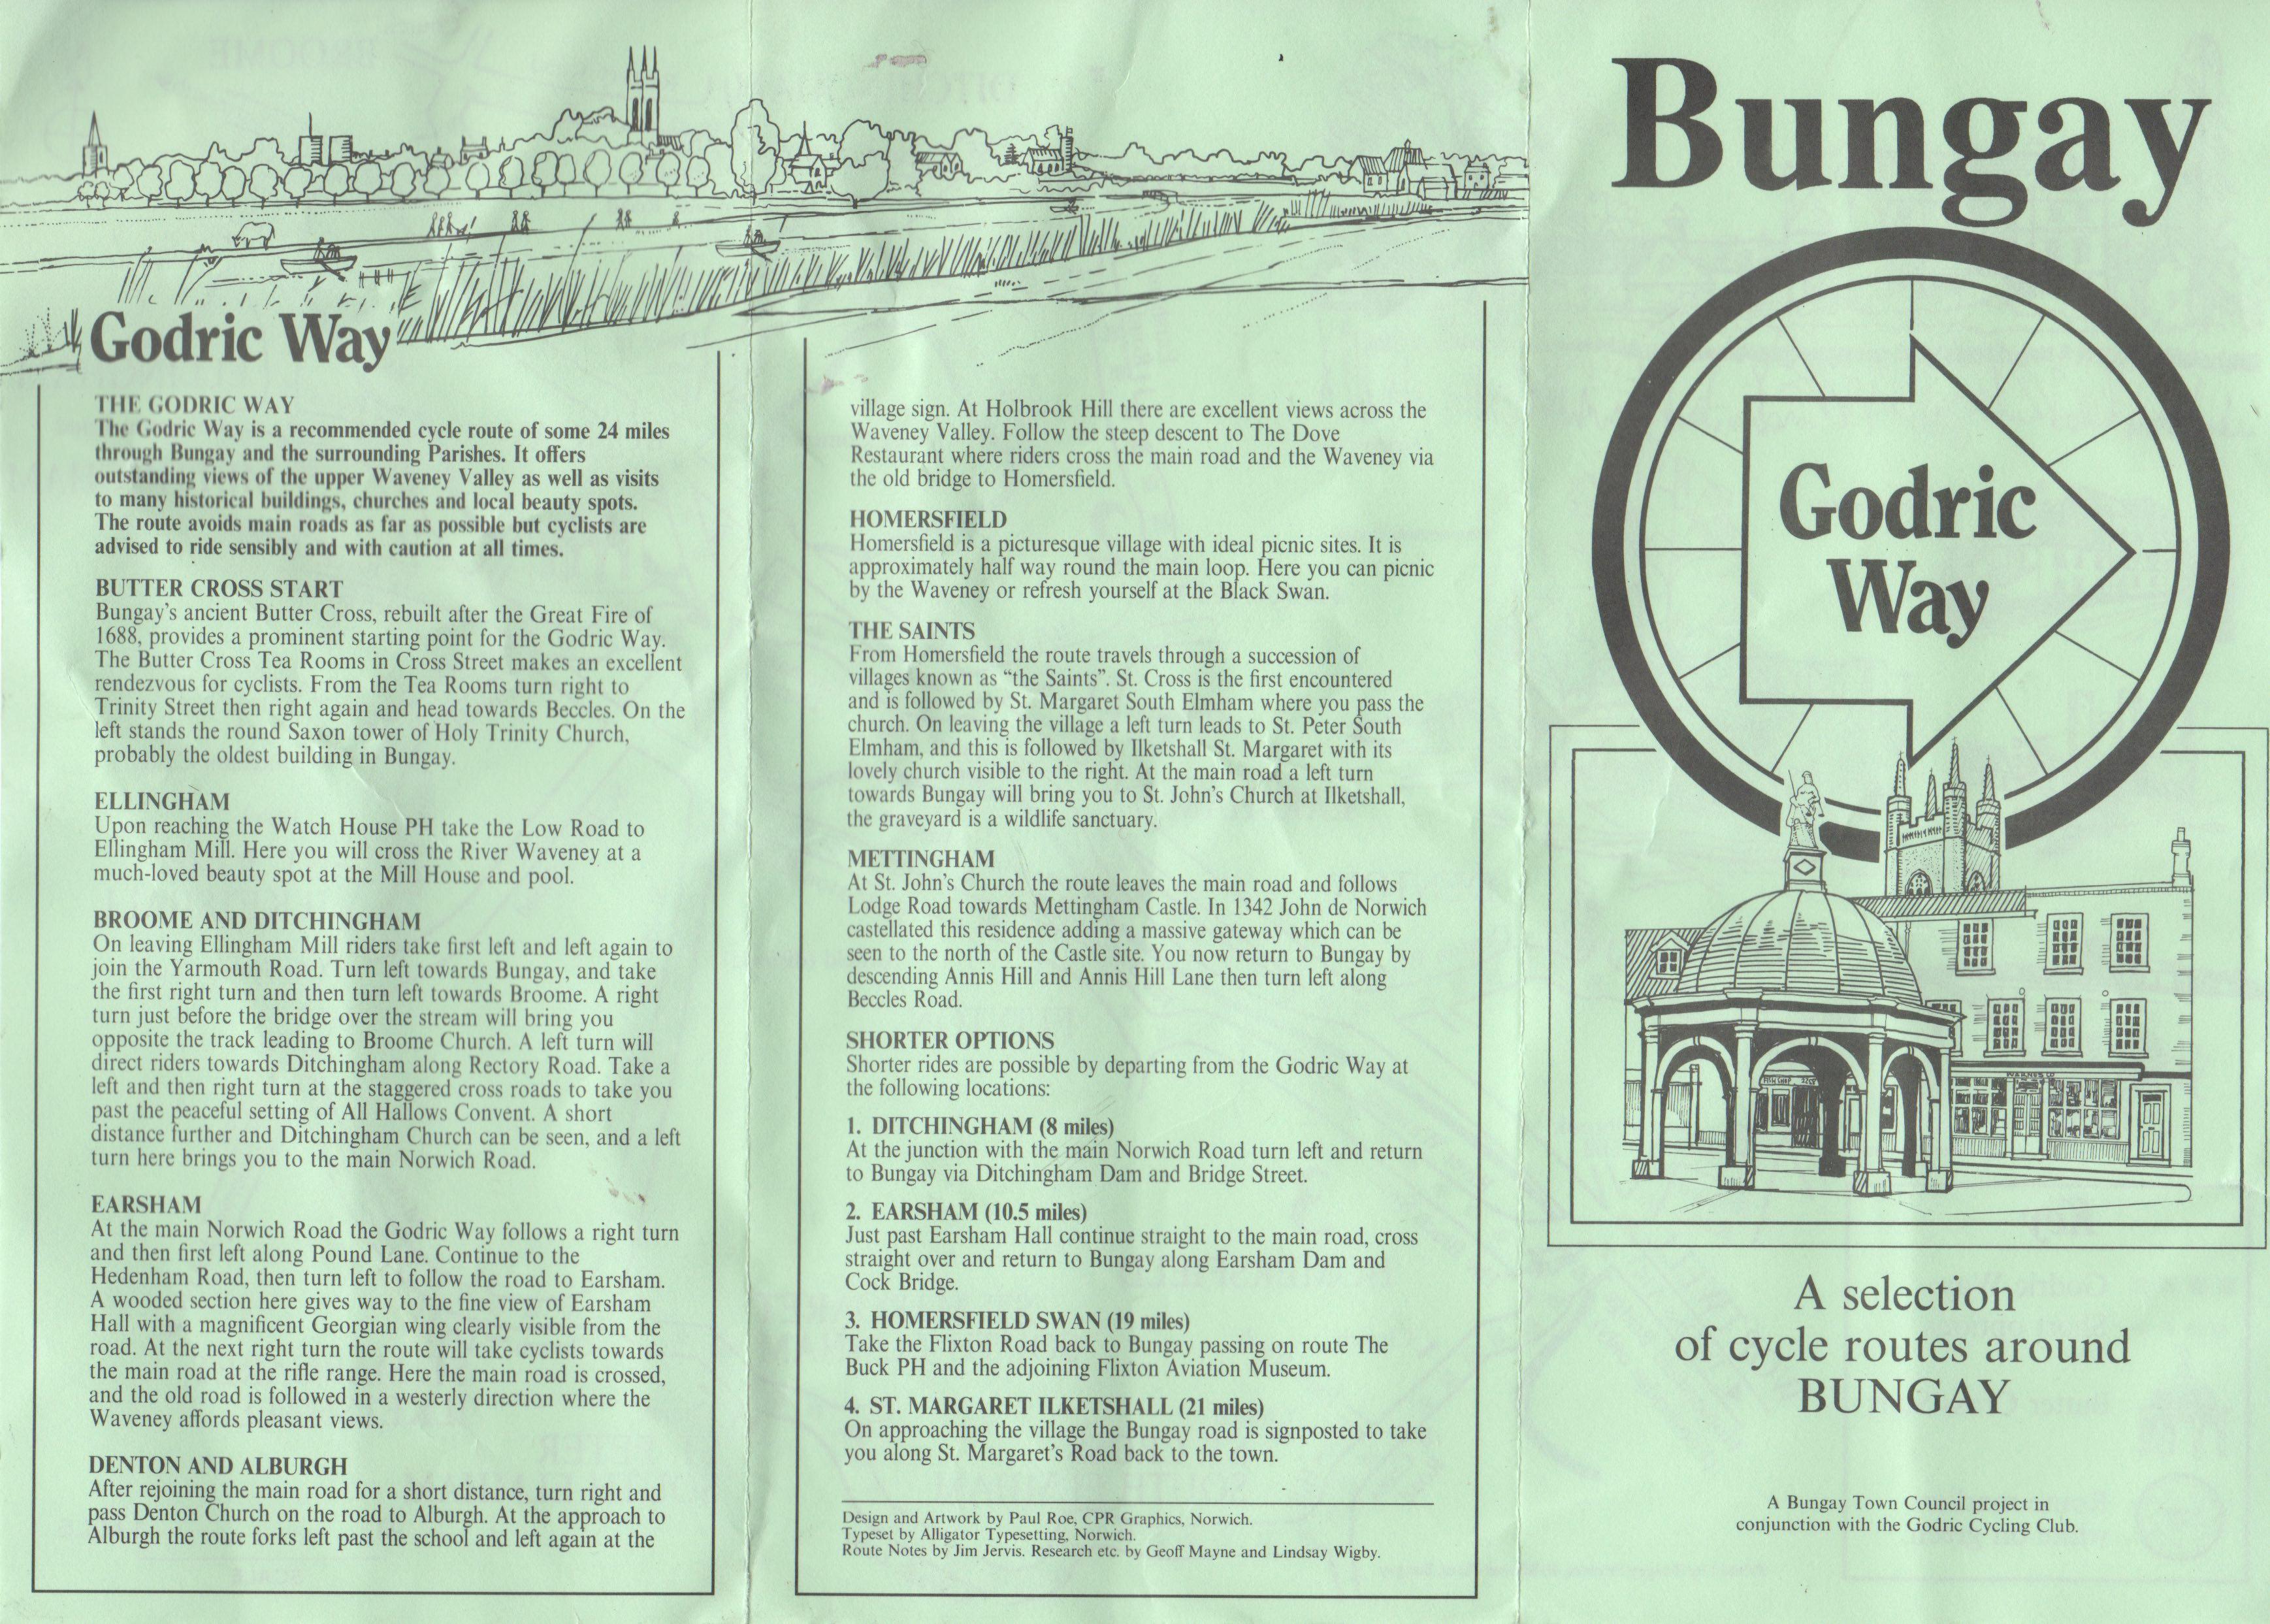 Bungay Godric Way Walk Guide